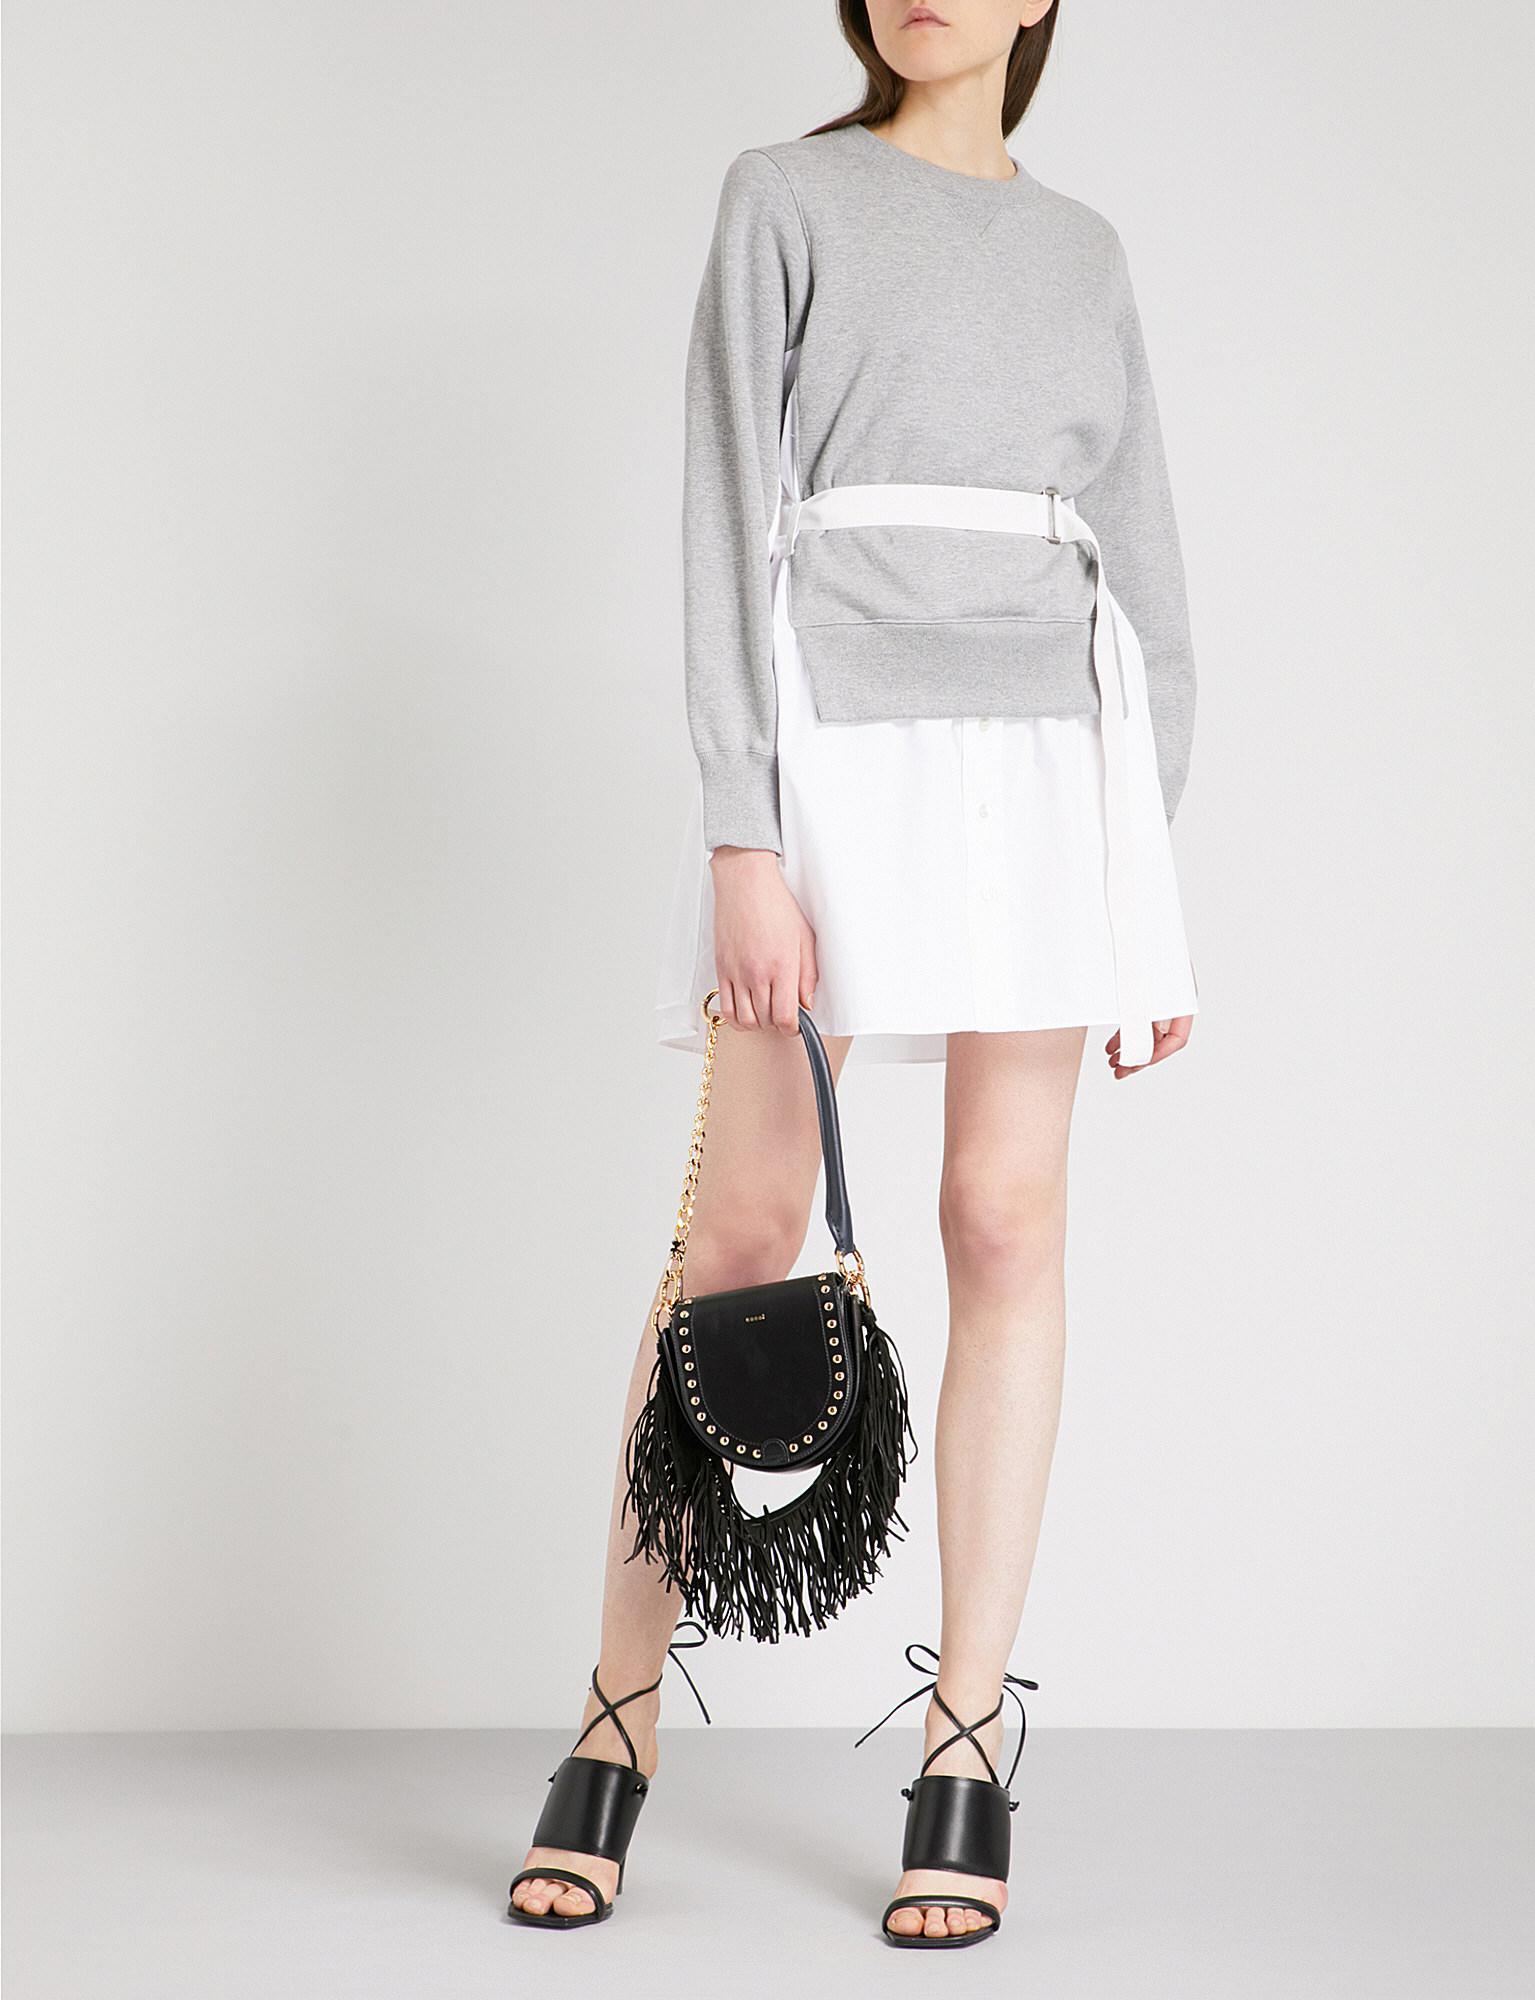 White Panelled Short Dress sacai qyrHs